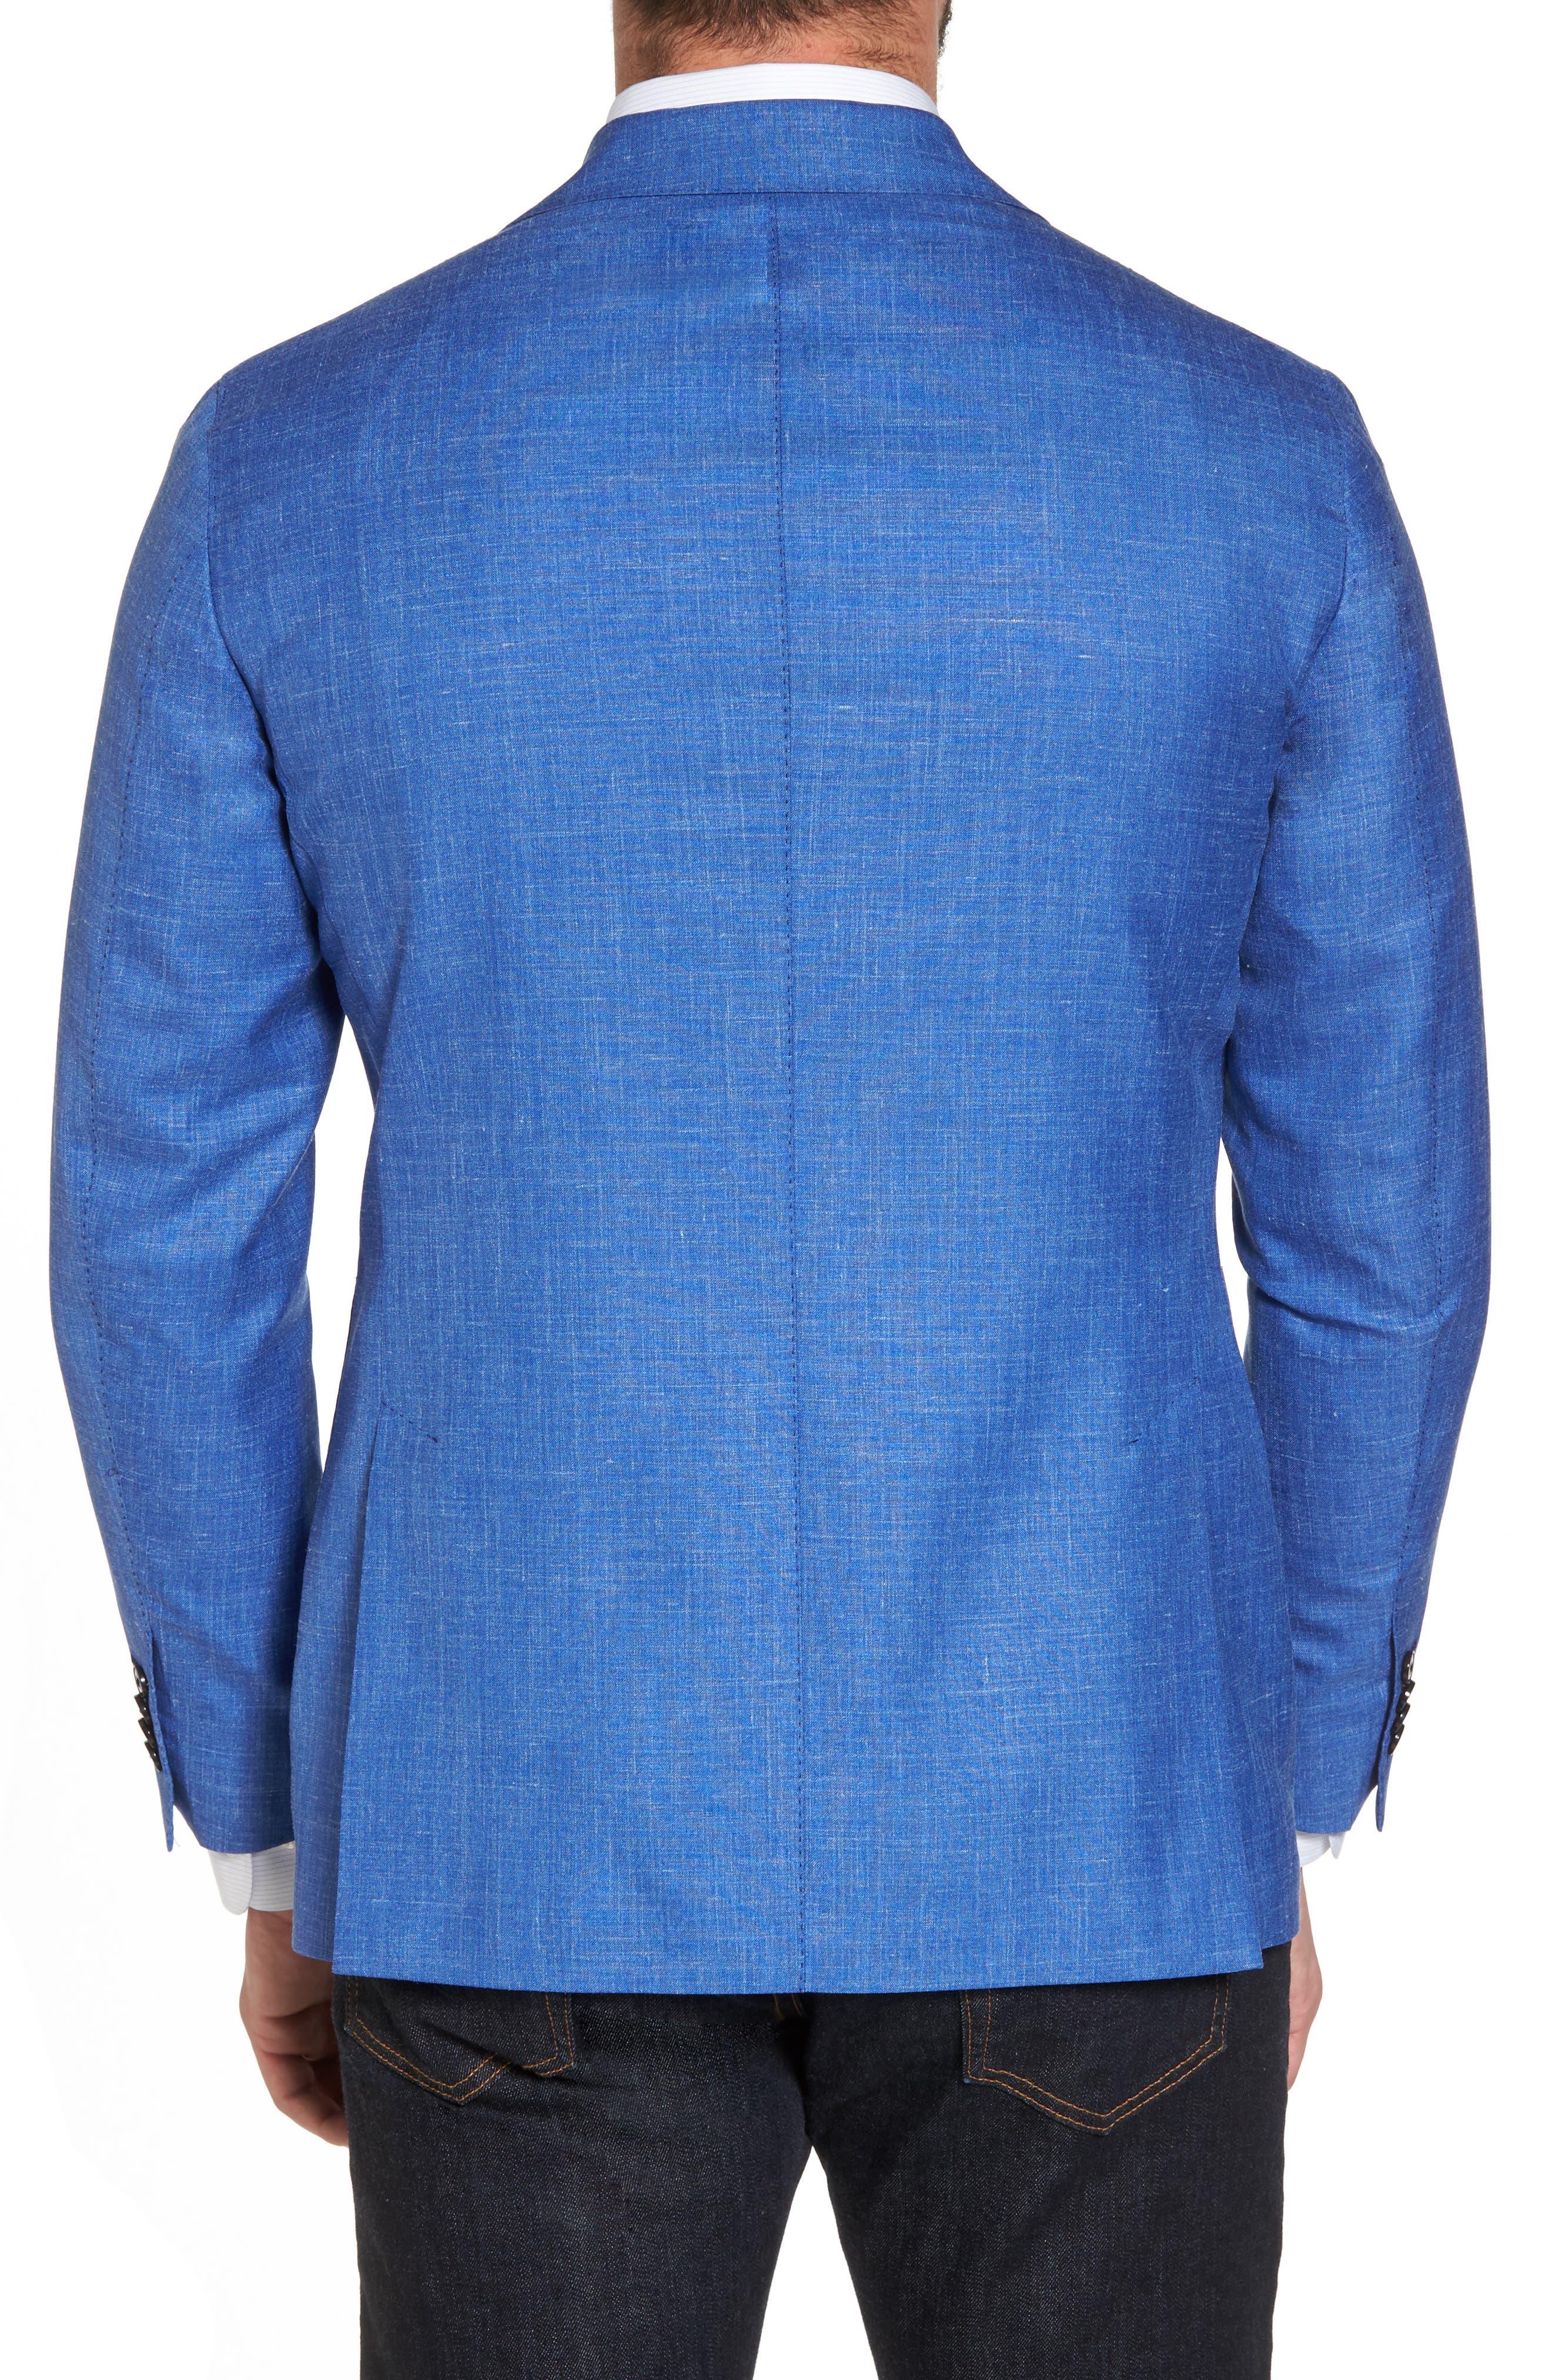 Classic Fit Wool Blend Blazer,                             Alternate thumbnail 2, color,                             Navy